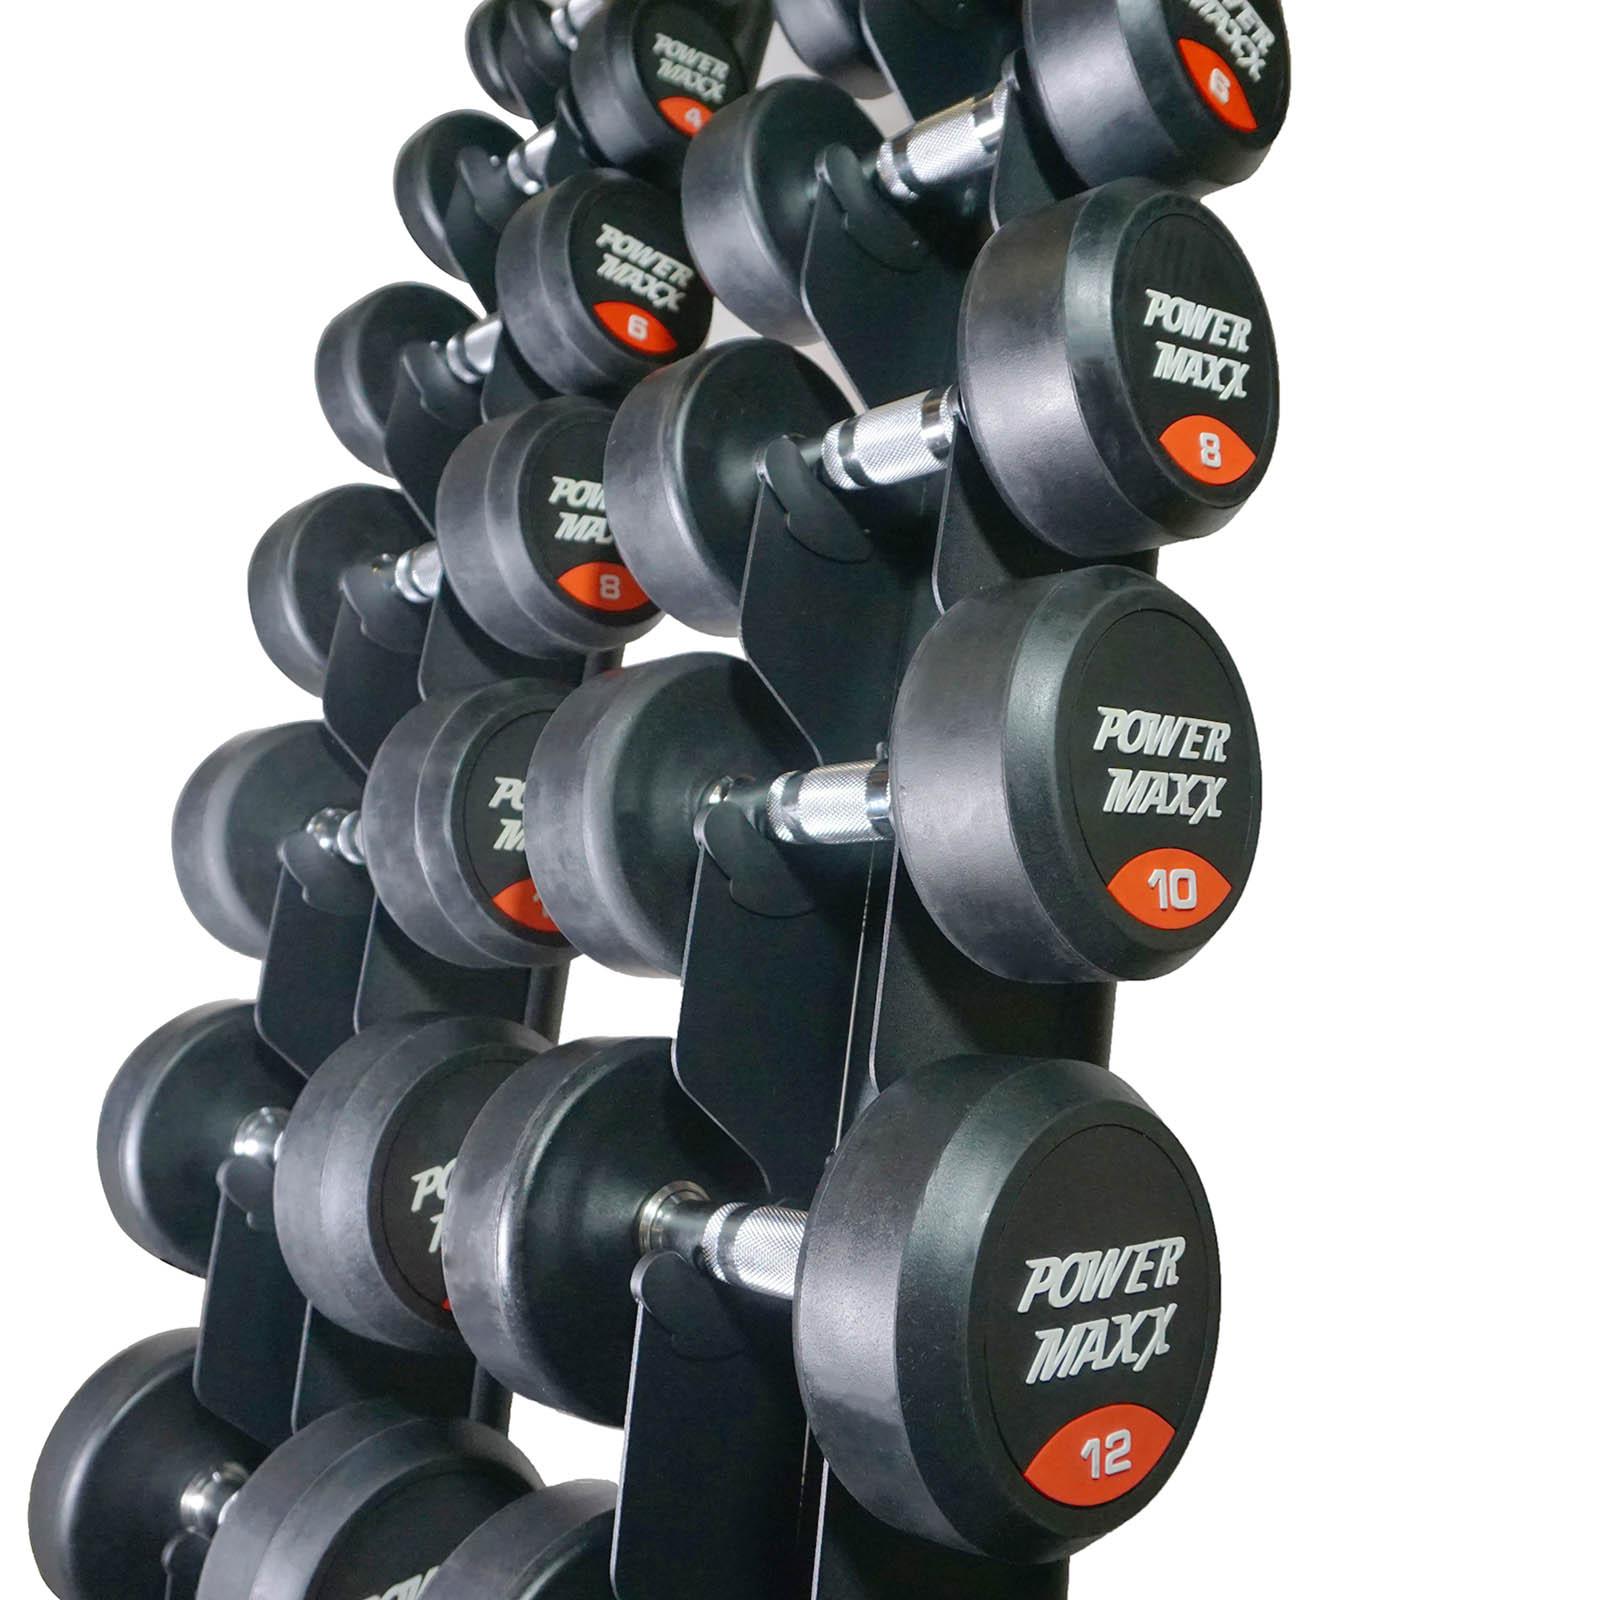 gym dumbbell set